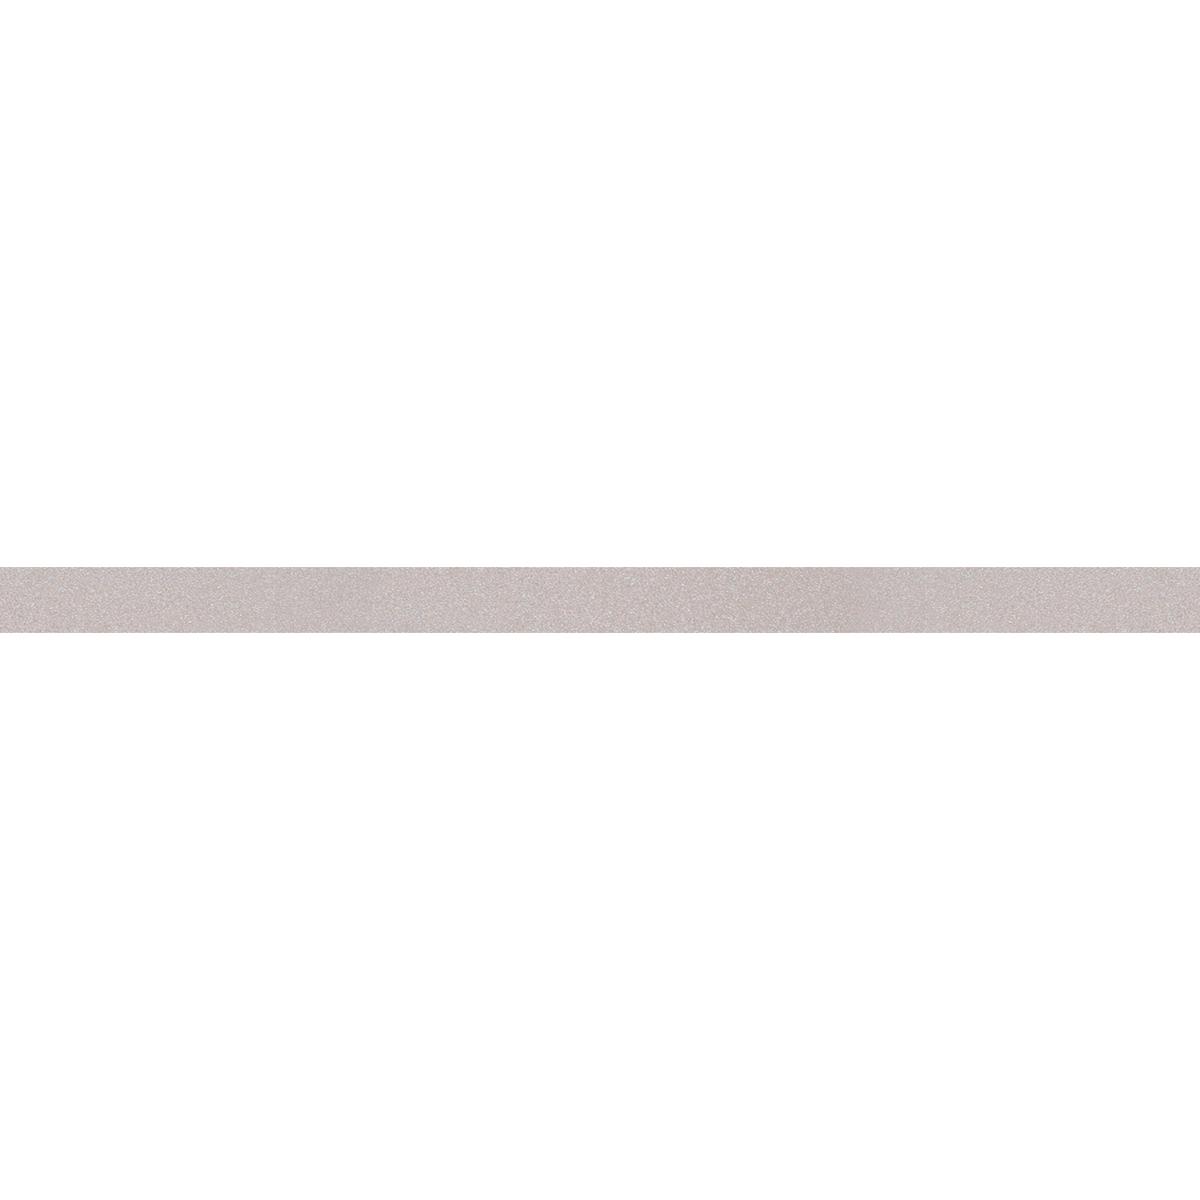 Фриз Cersanit  Sakura Border Modern  2,5x45